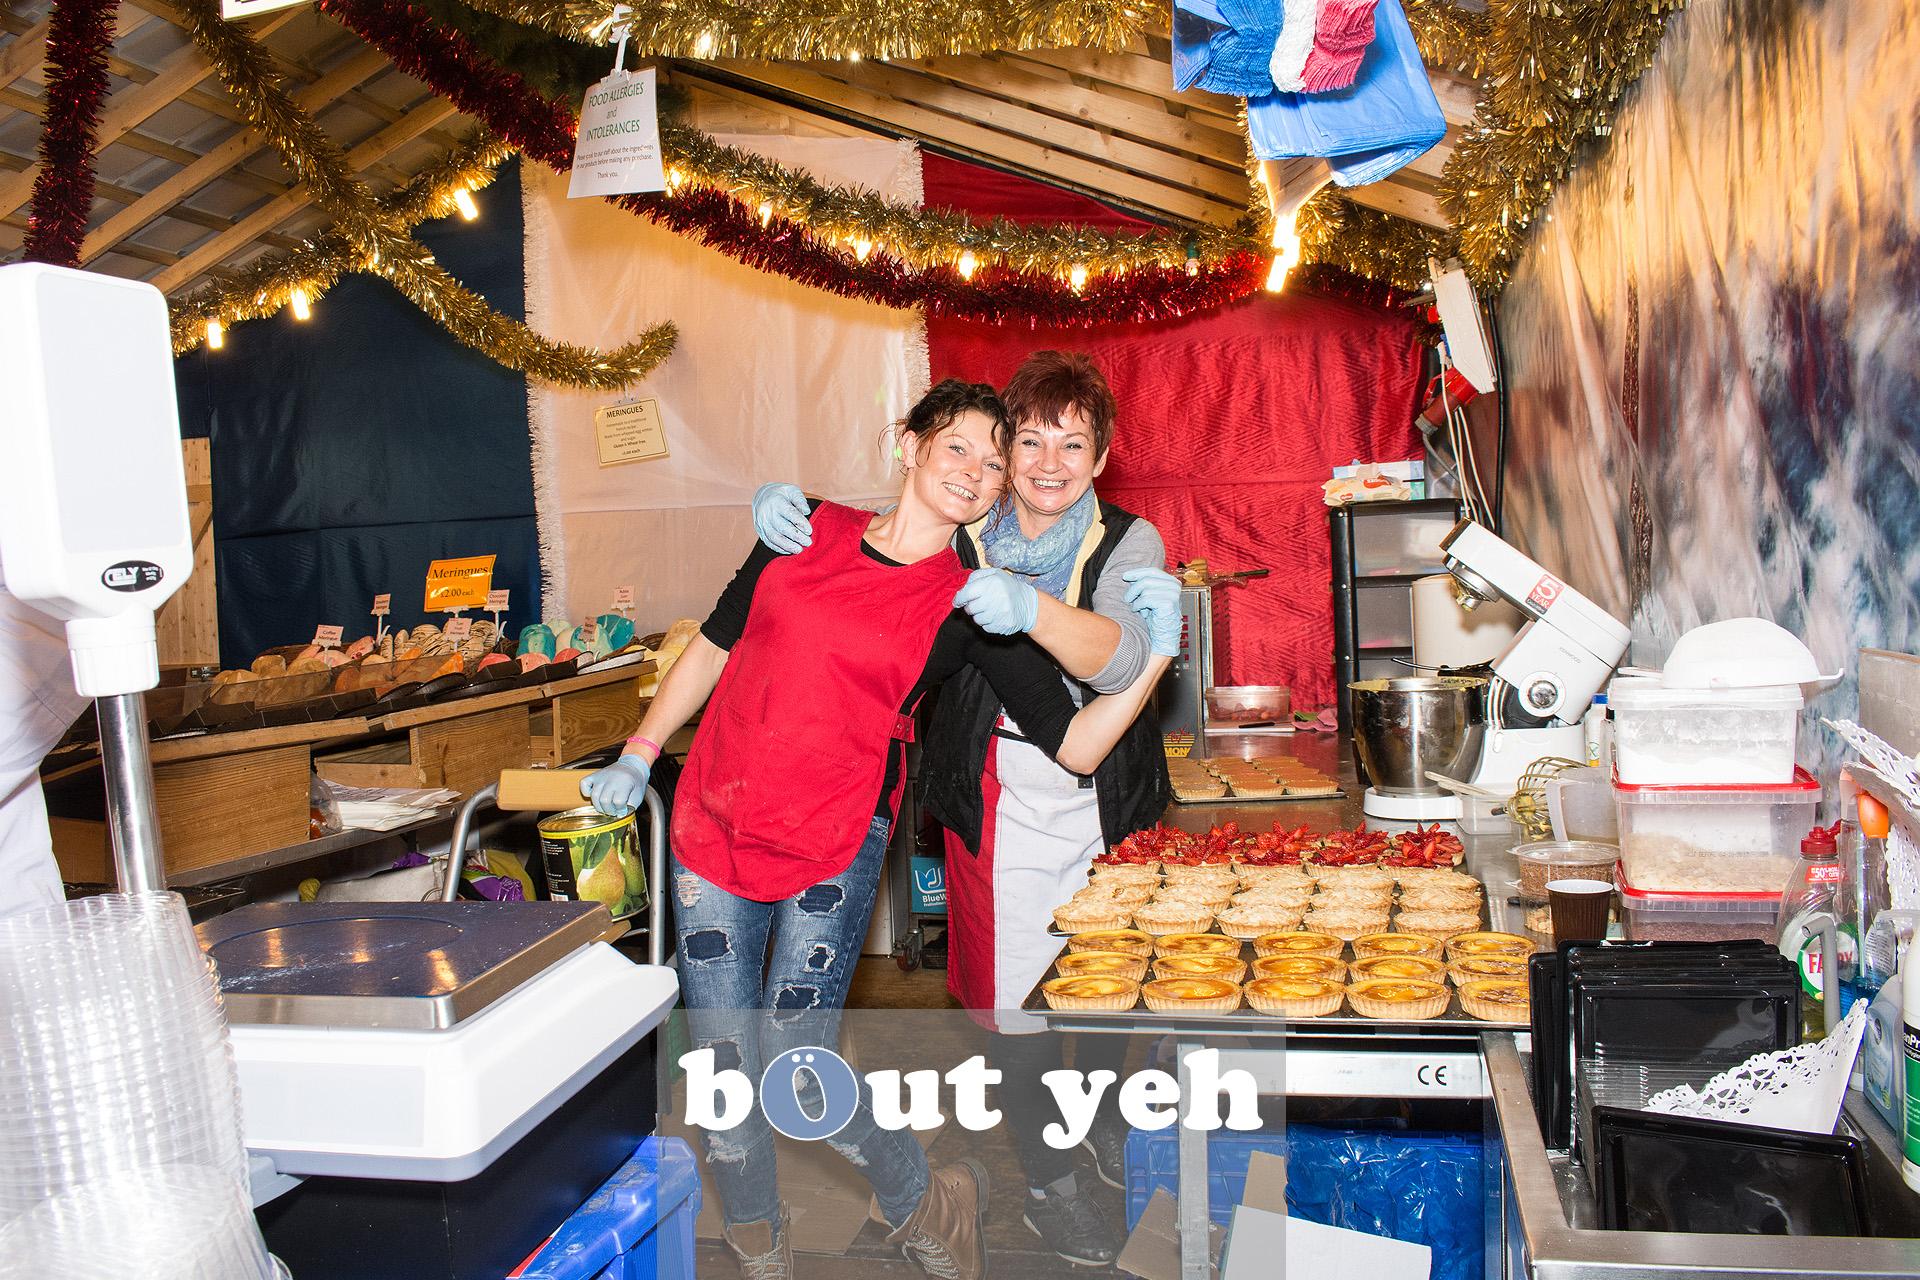 Workers at Belfast Christmas Market enjoying their work. Photo 3287.